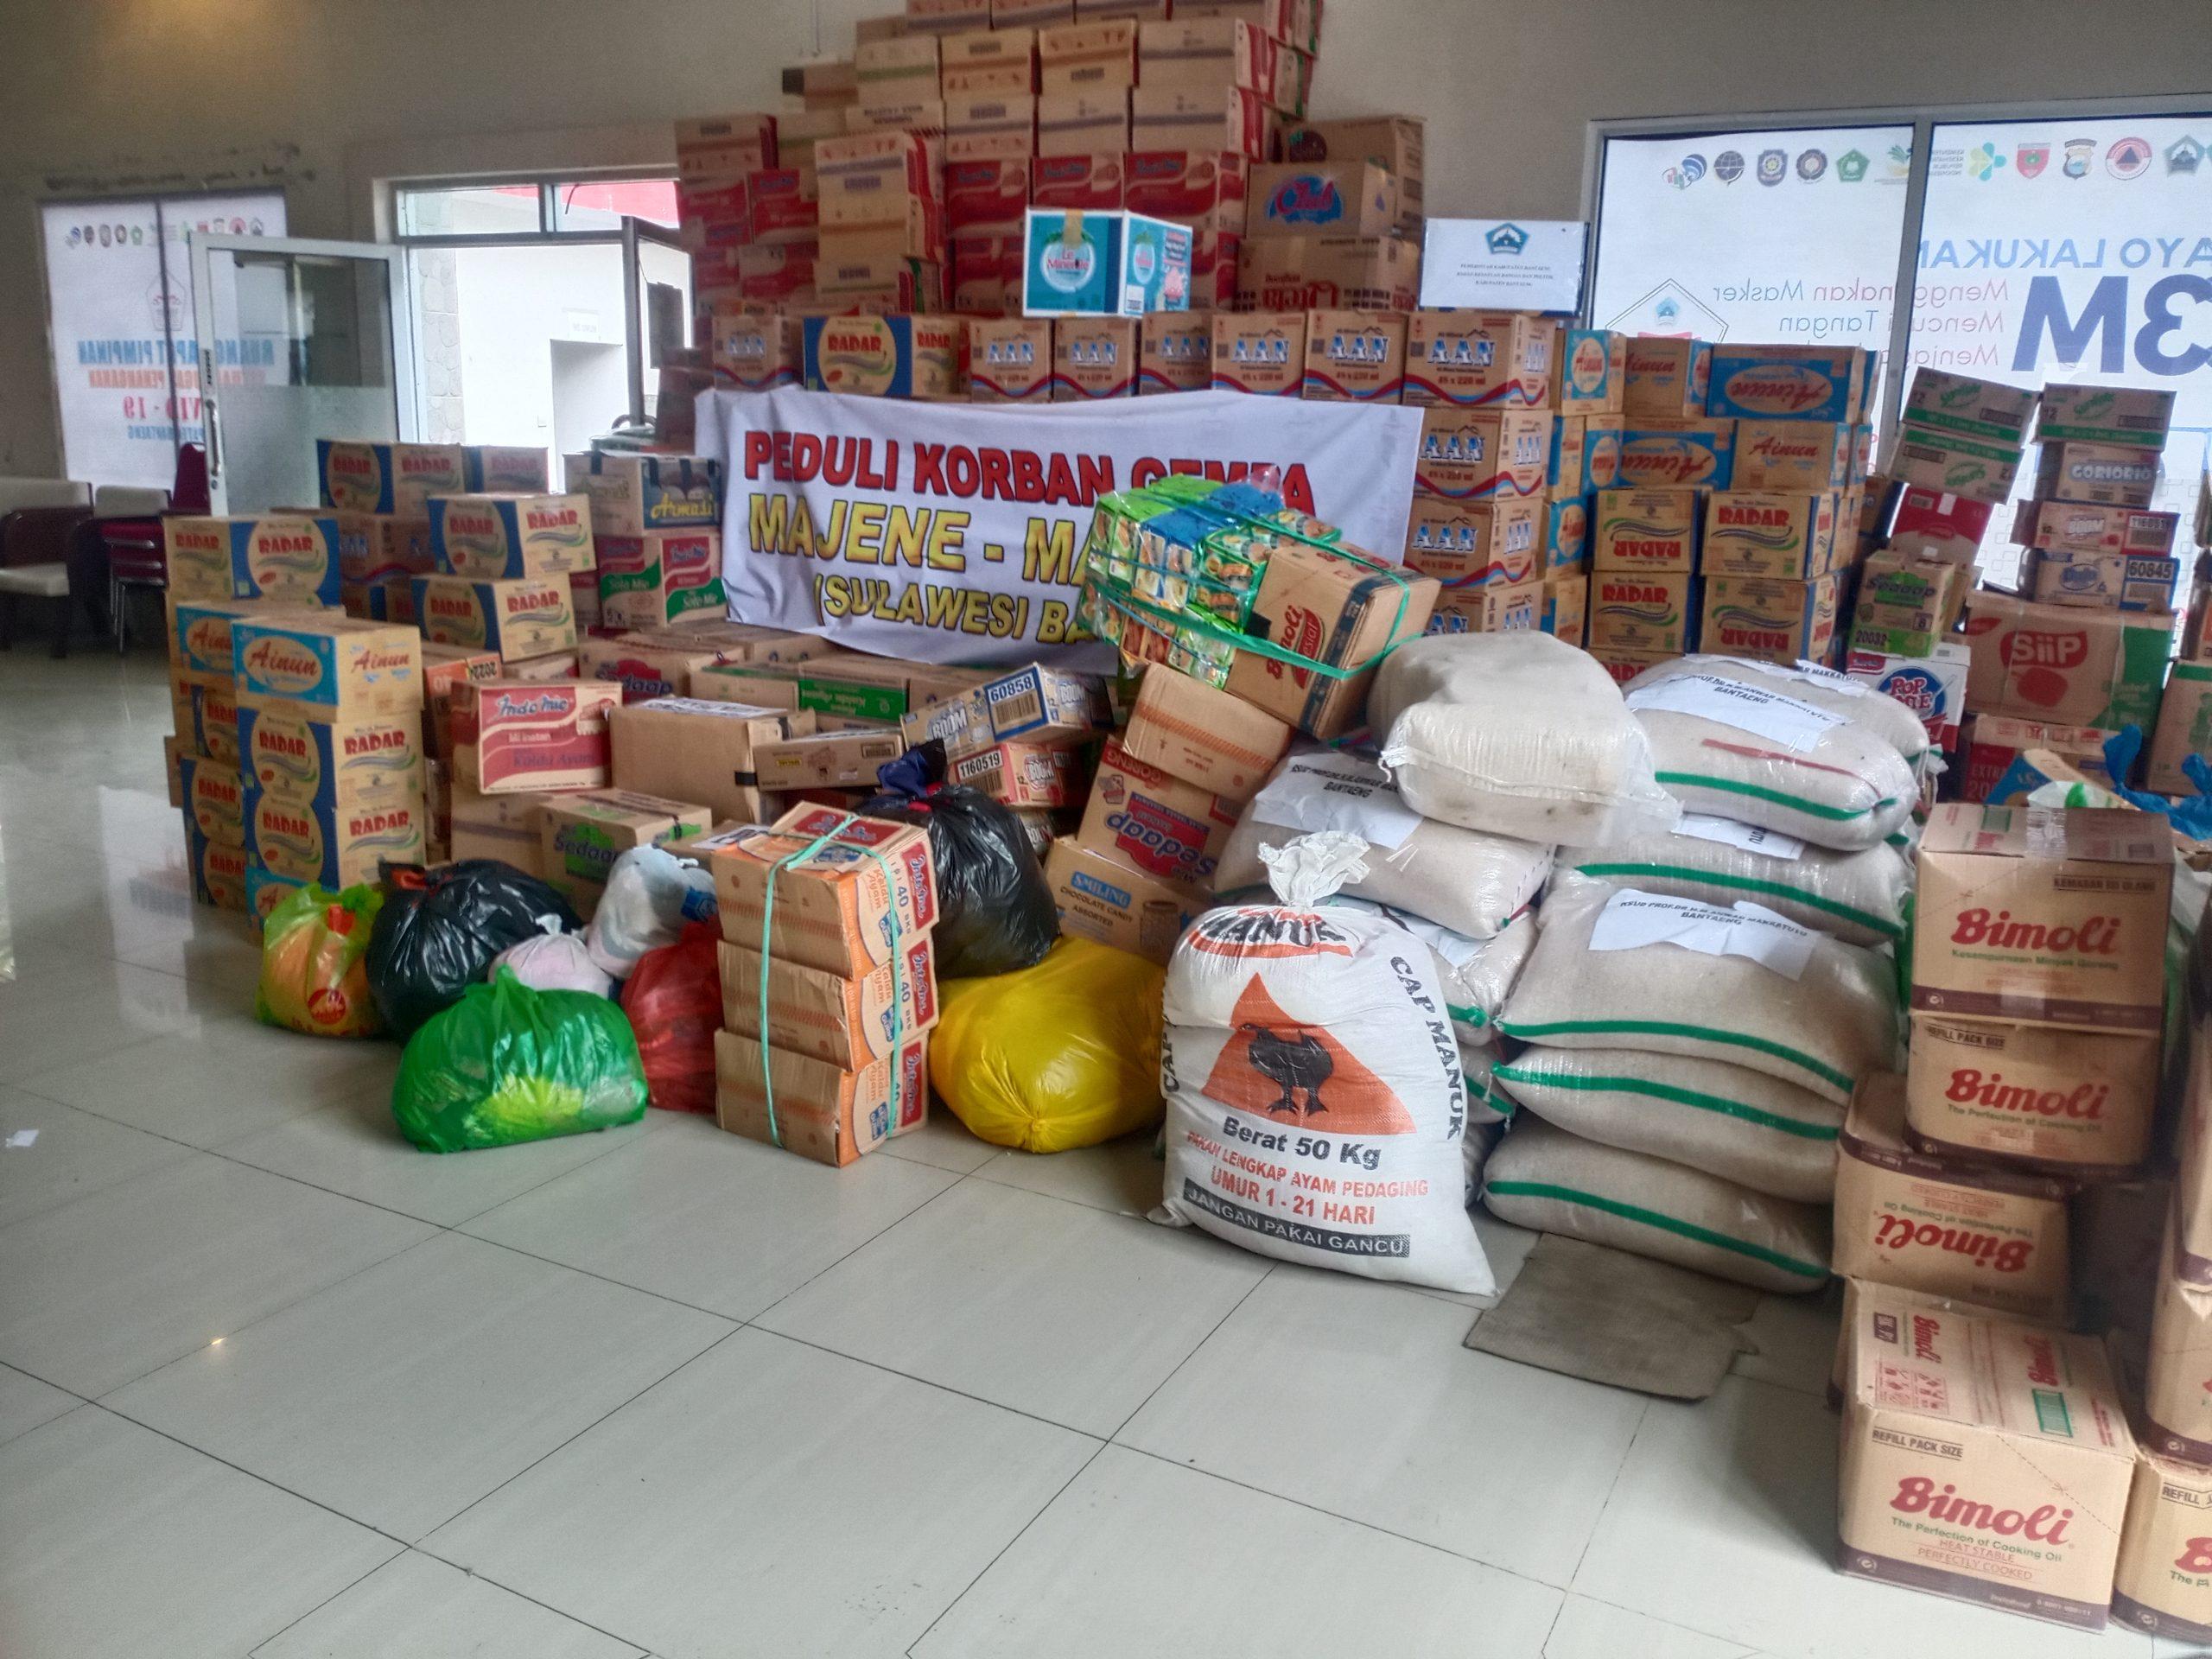 Paket bantuan yang akan dikirim kke korban terdampak gempa di mamuju